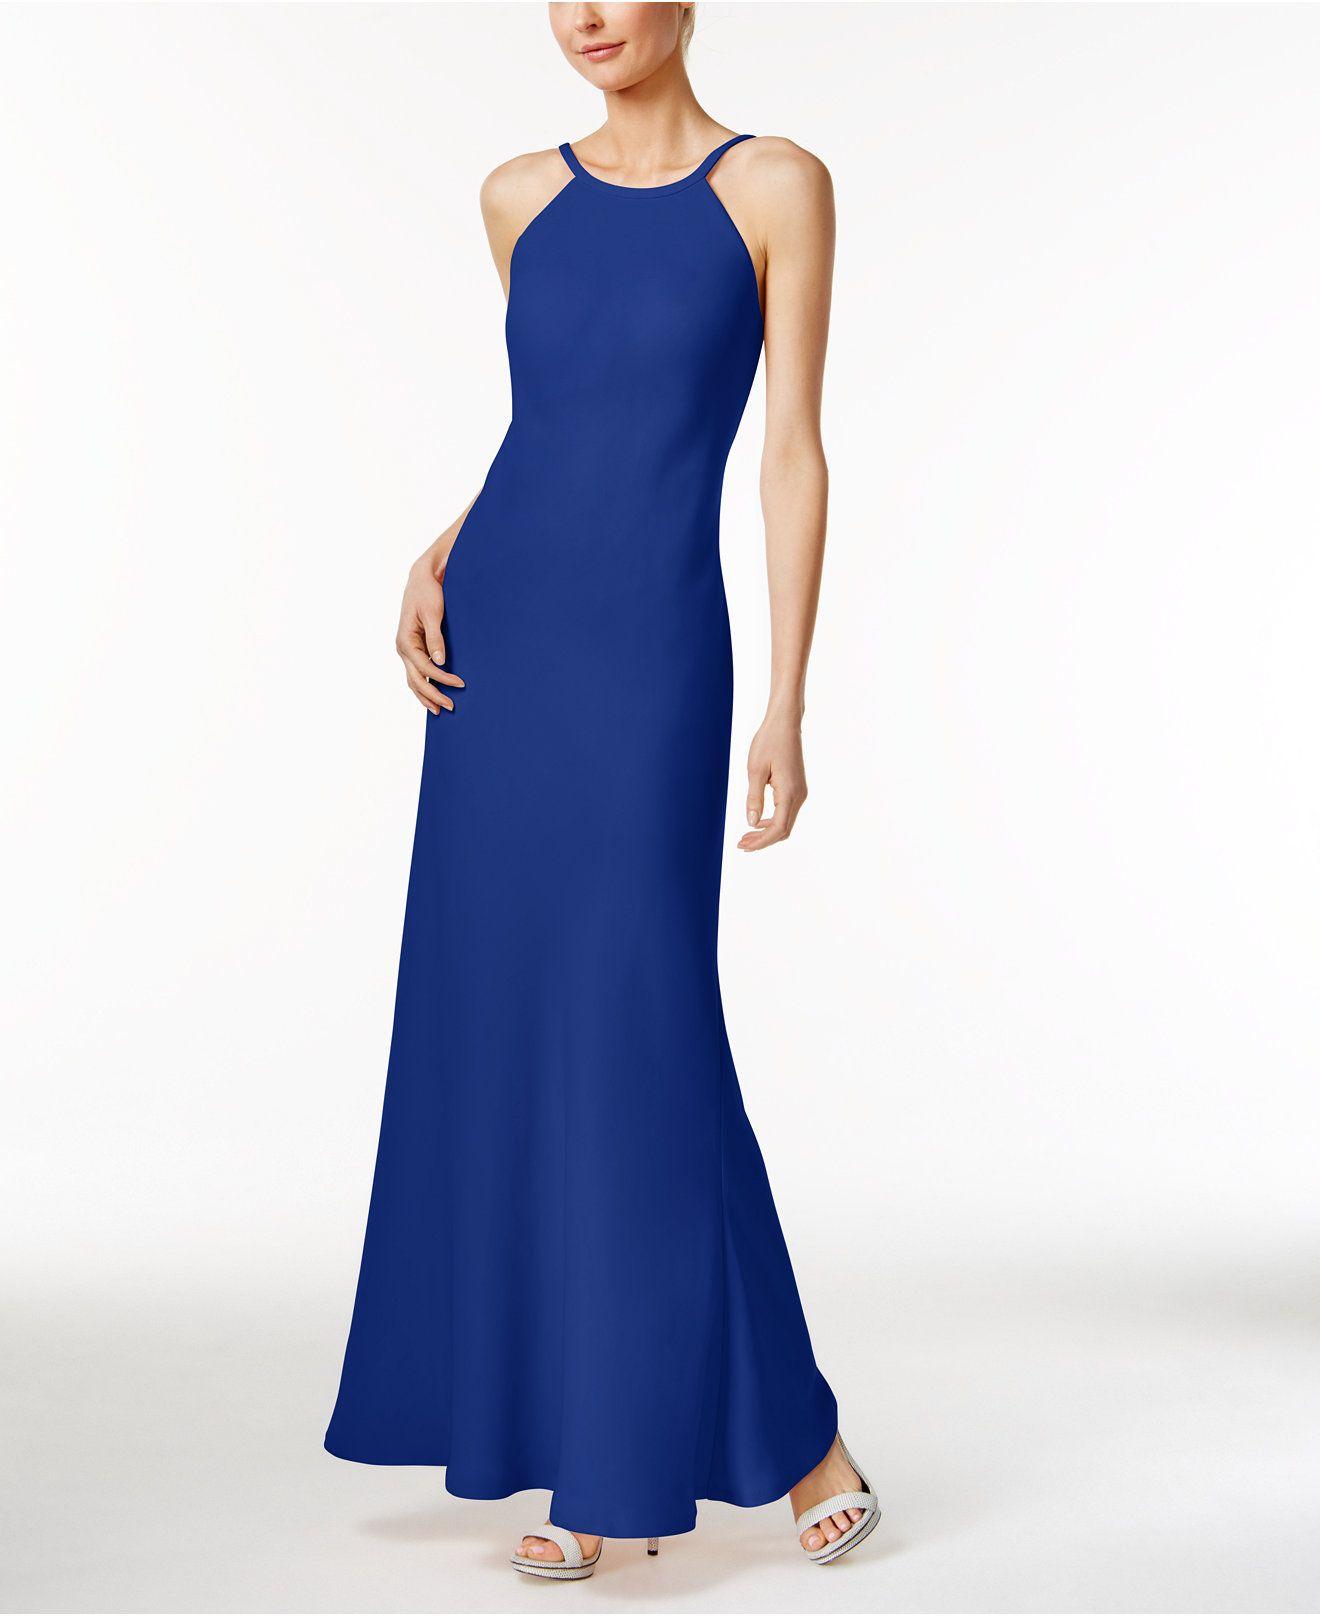 Calvin Klein Open-Back Halter Gown | Shops, .tyxgb76aj